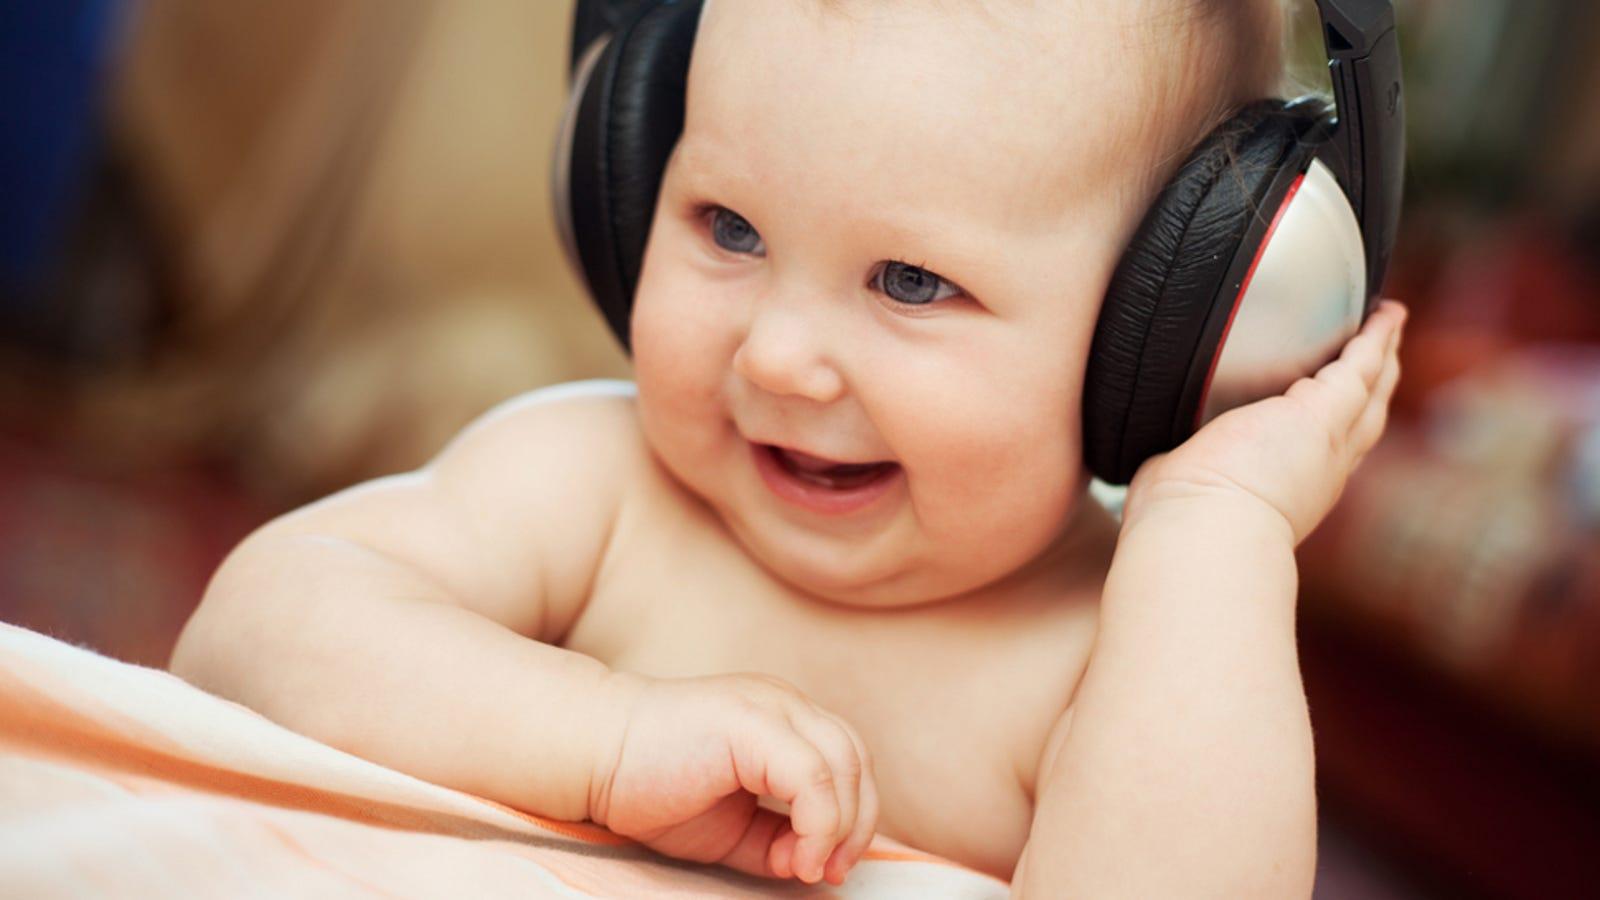 Learn how lullabies treat premature babies